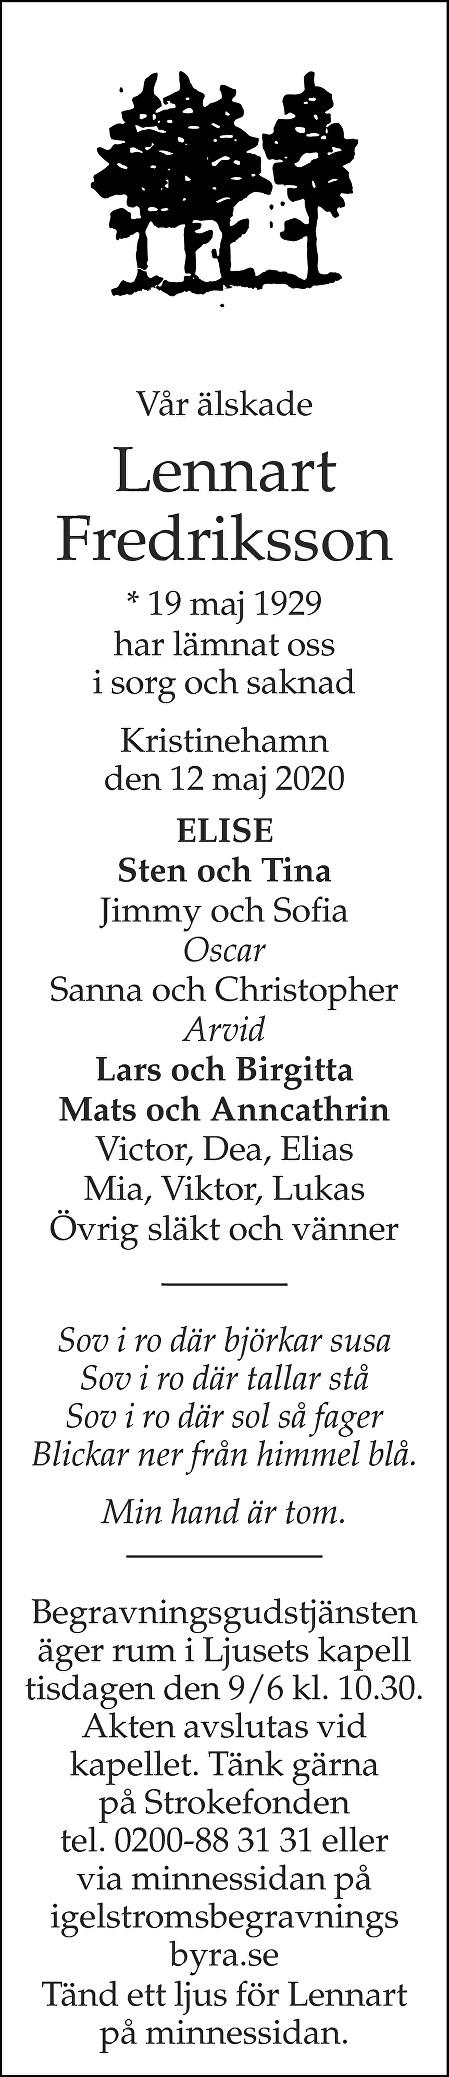 Lennart Fredriksson Death notice